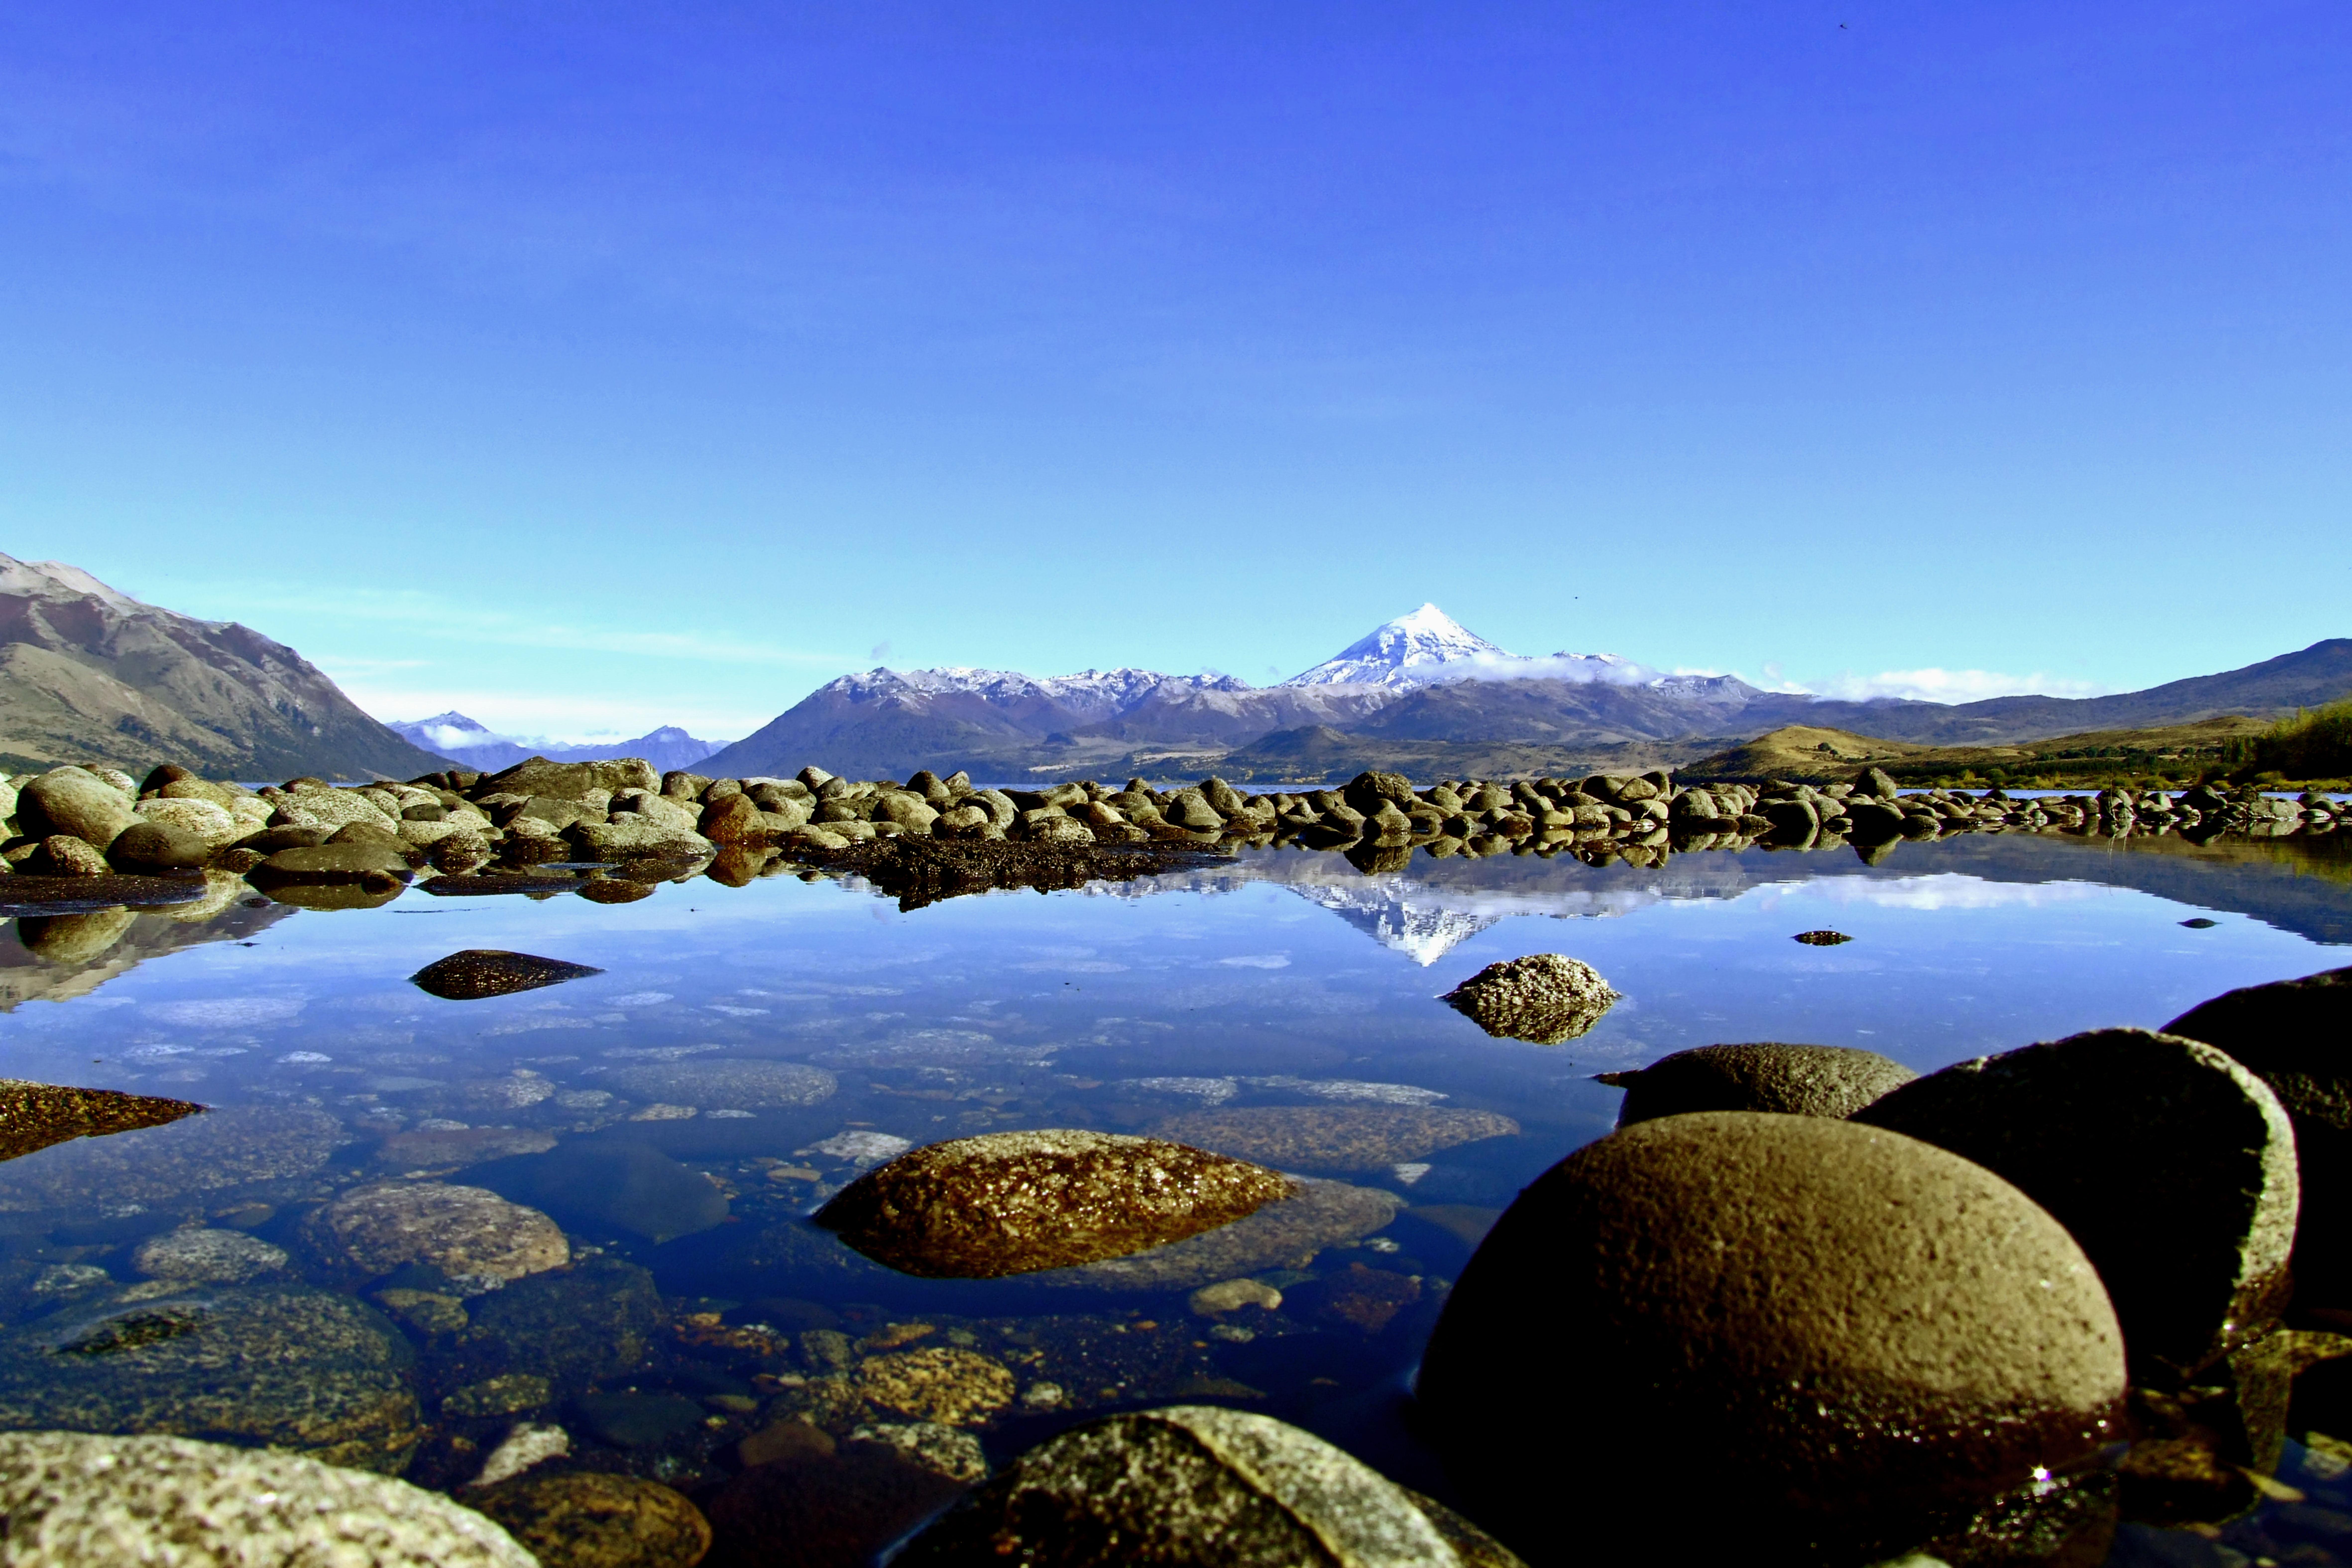 Wallpaper Mountain Mountains Reflection Southamerica